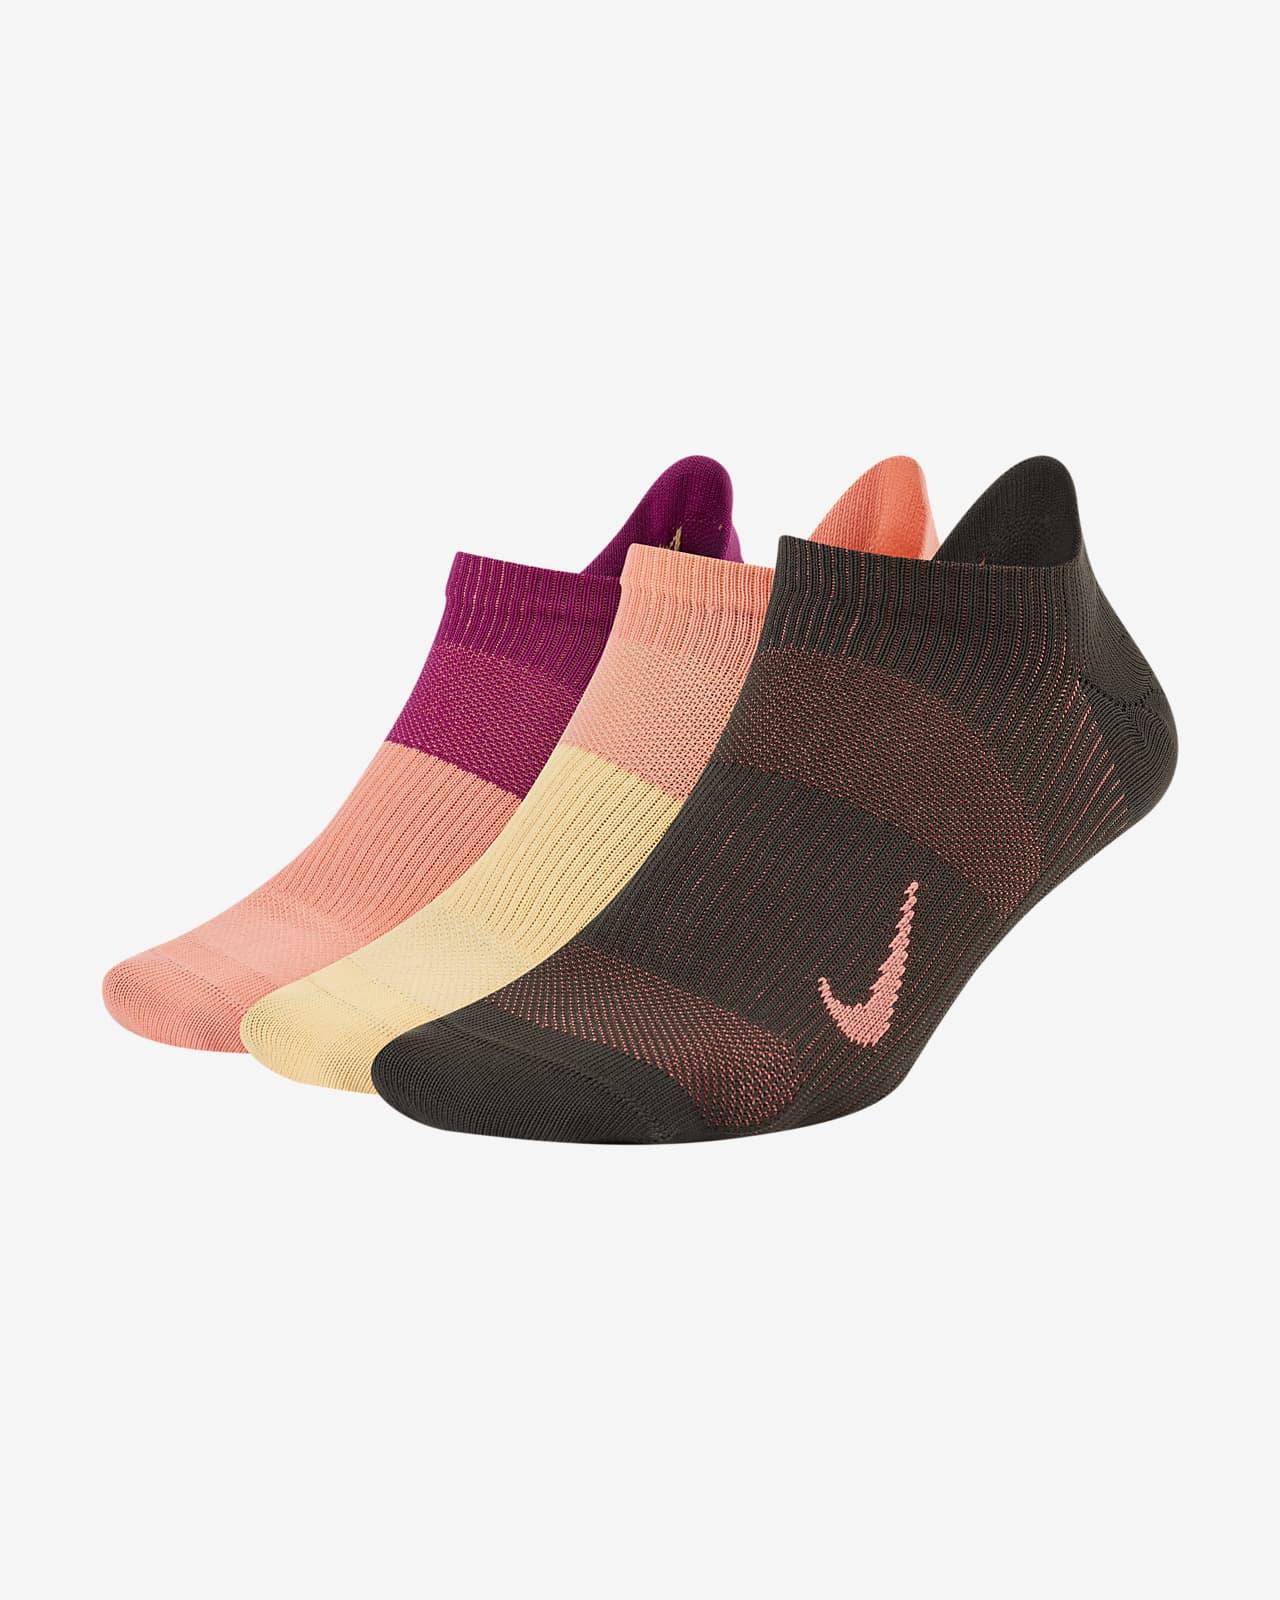 Nike Everyday Plus Lightweight Women's